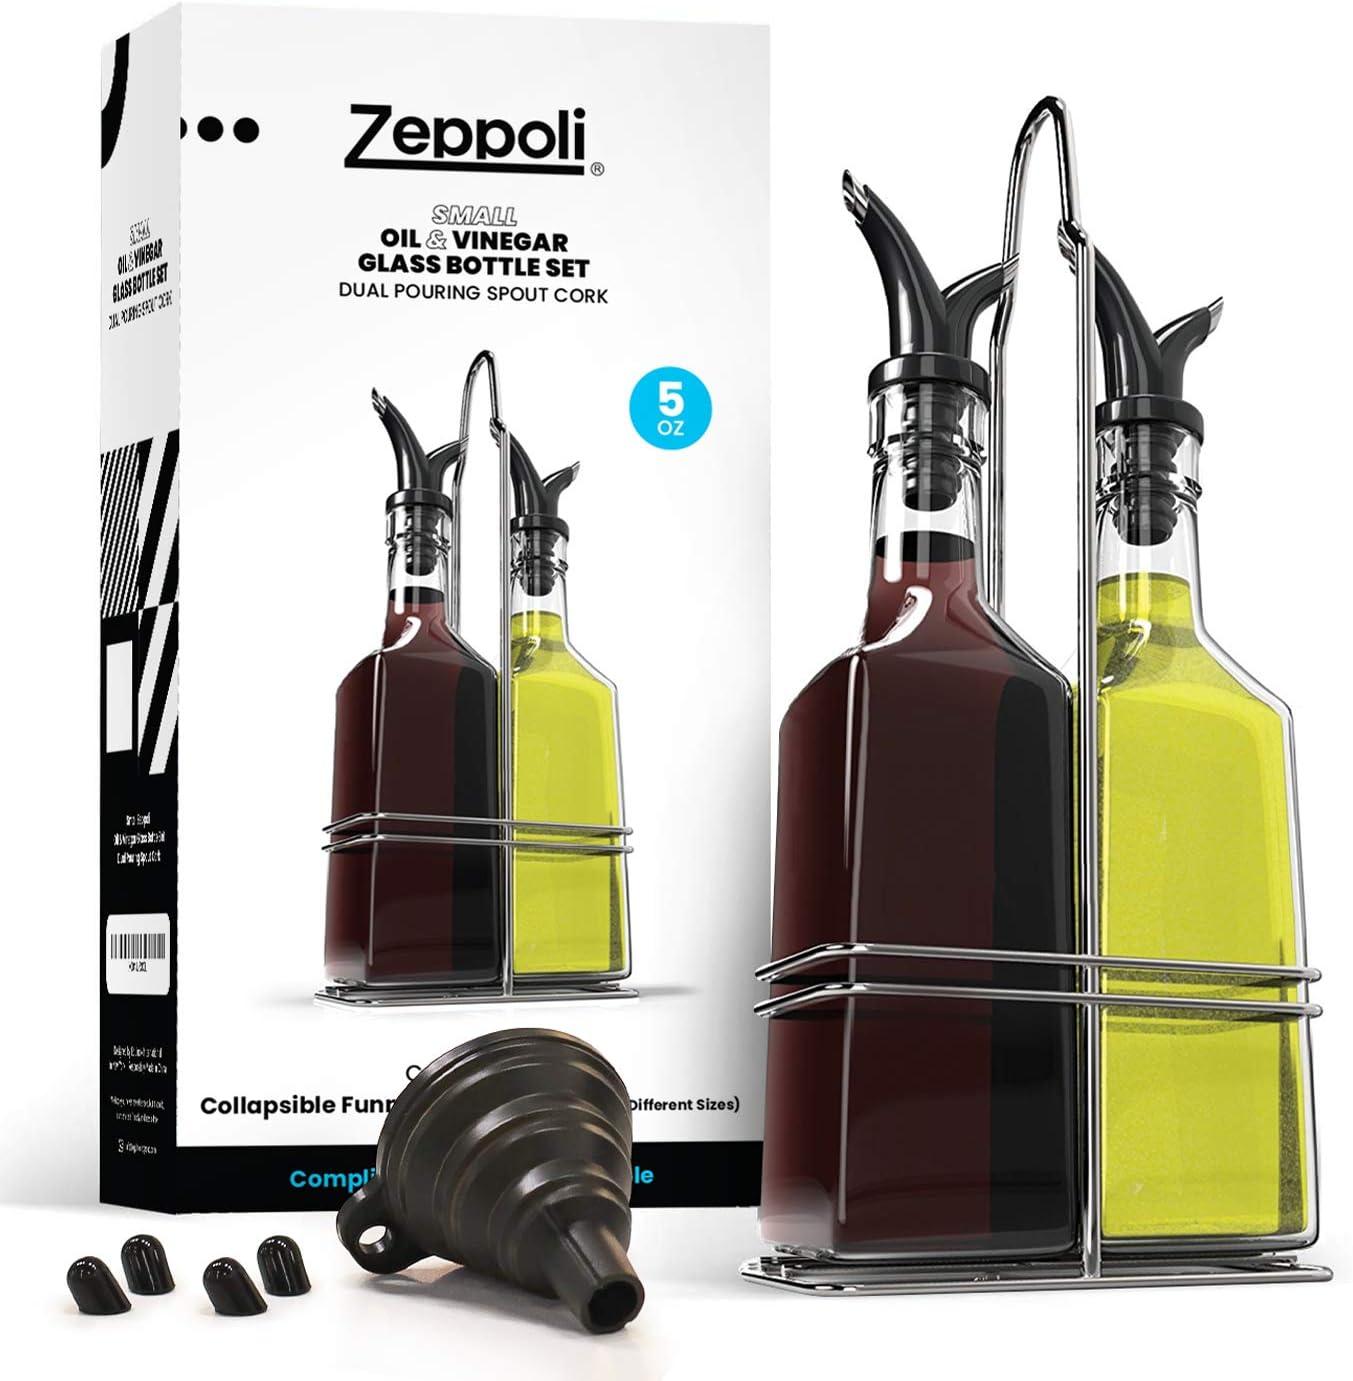 Zeppoli Oil and Vinegar Bottle Set with Stainless Steel Rack and Removable Cork – Dual Olive Oil Spout – Olive Oil Dispenser, Olive Oil Bottle and Vinegar Bottle Glass Set (5 oz)